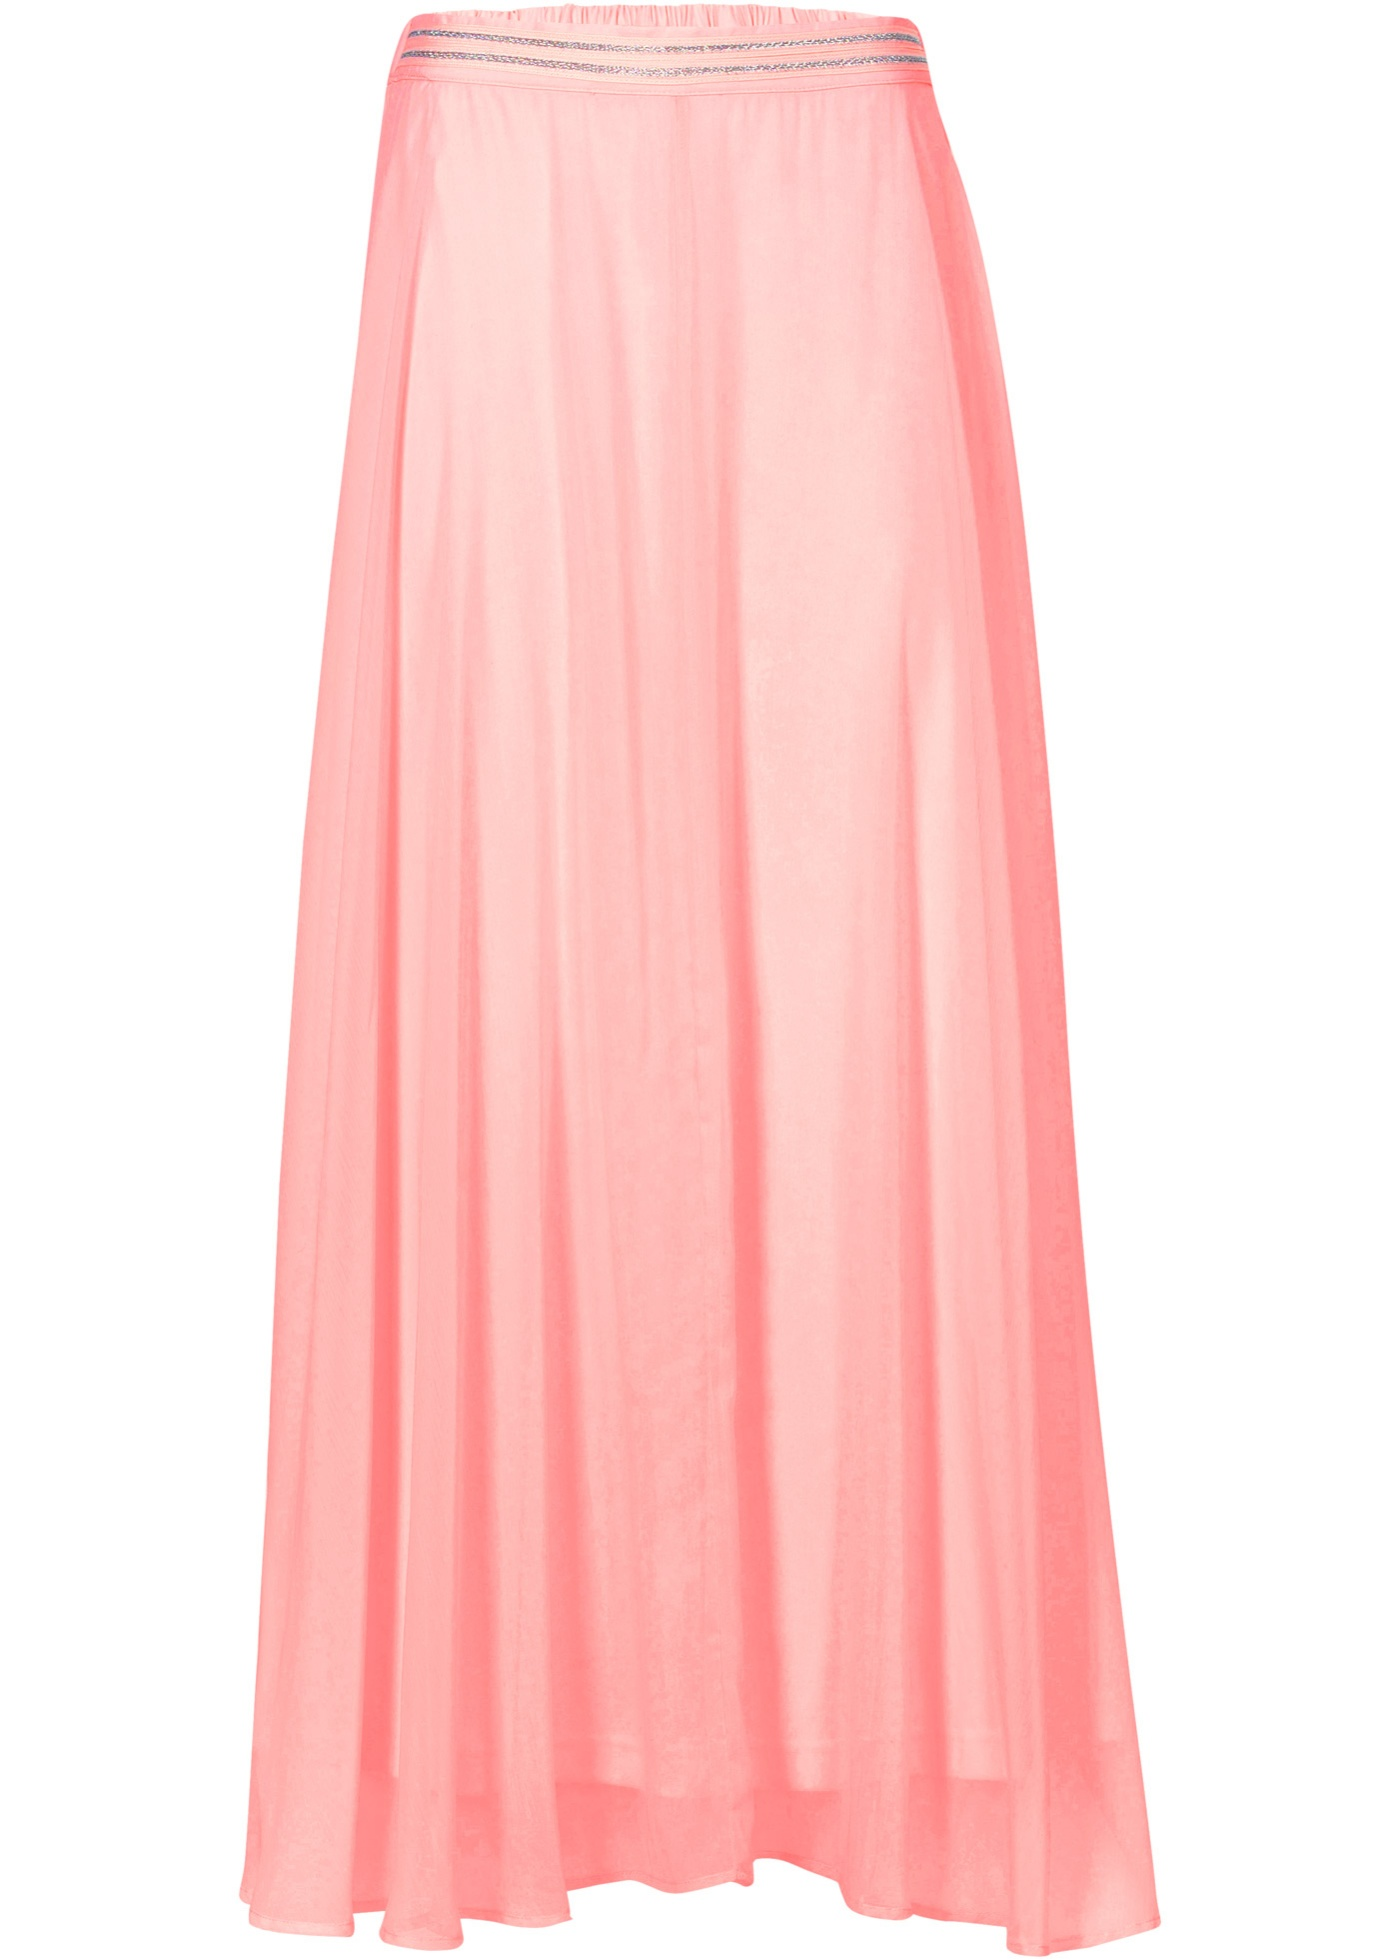 Jupe longue rose femme - bonprix